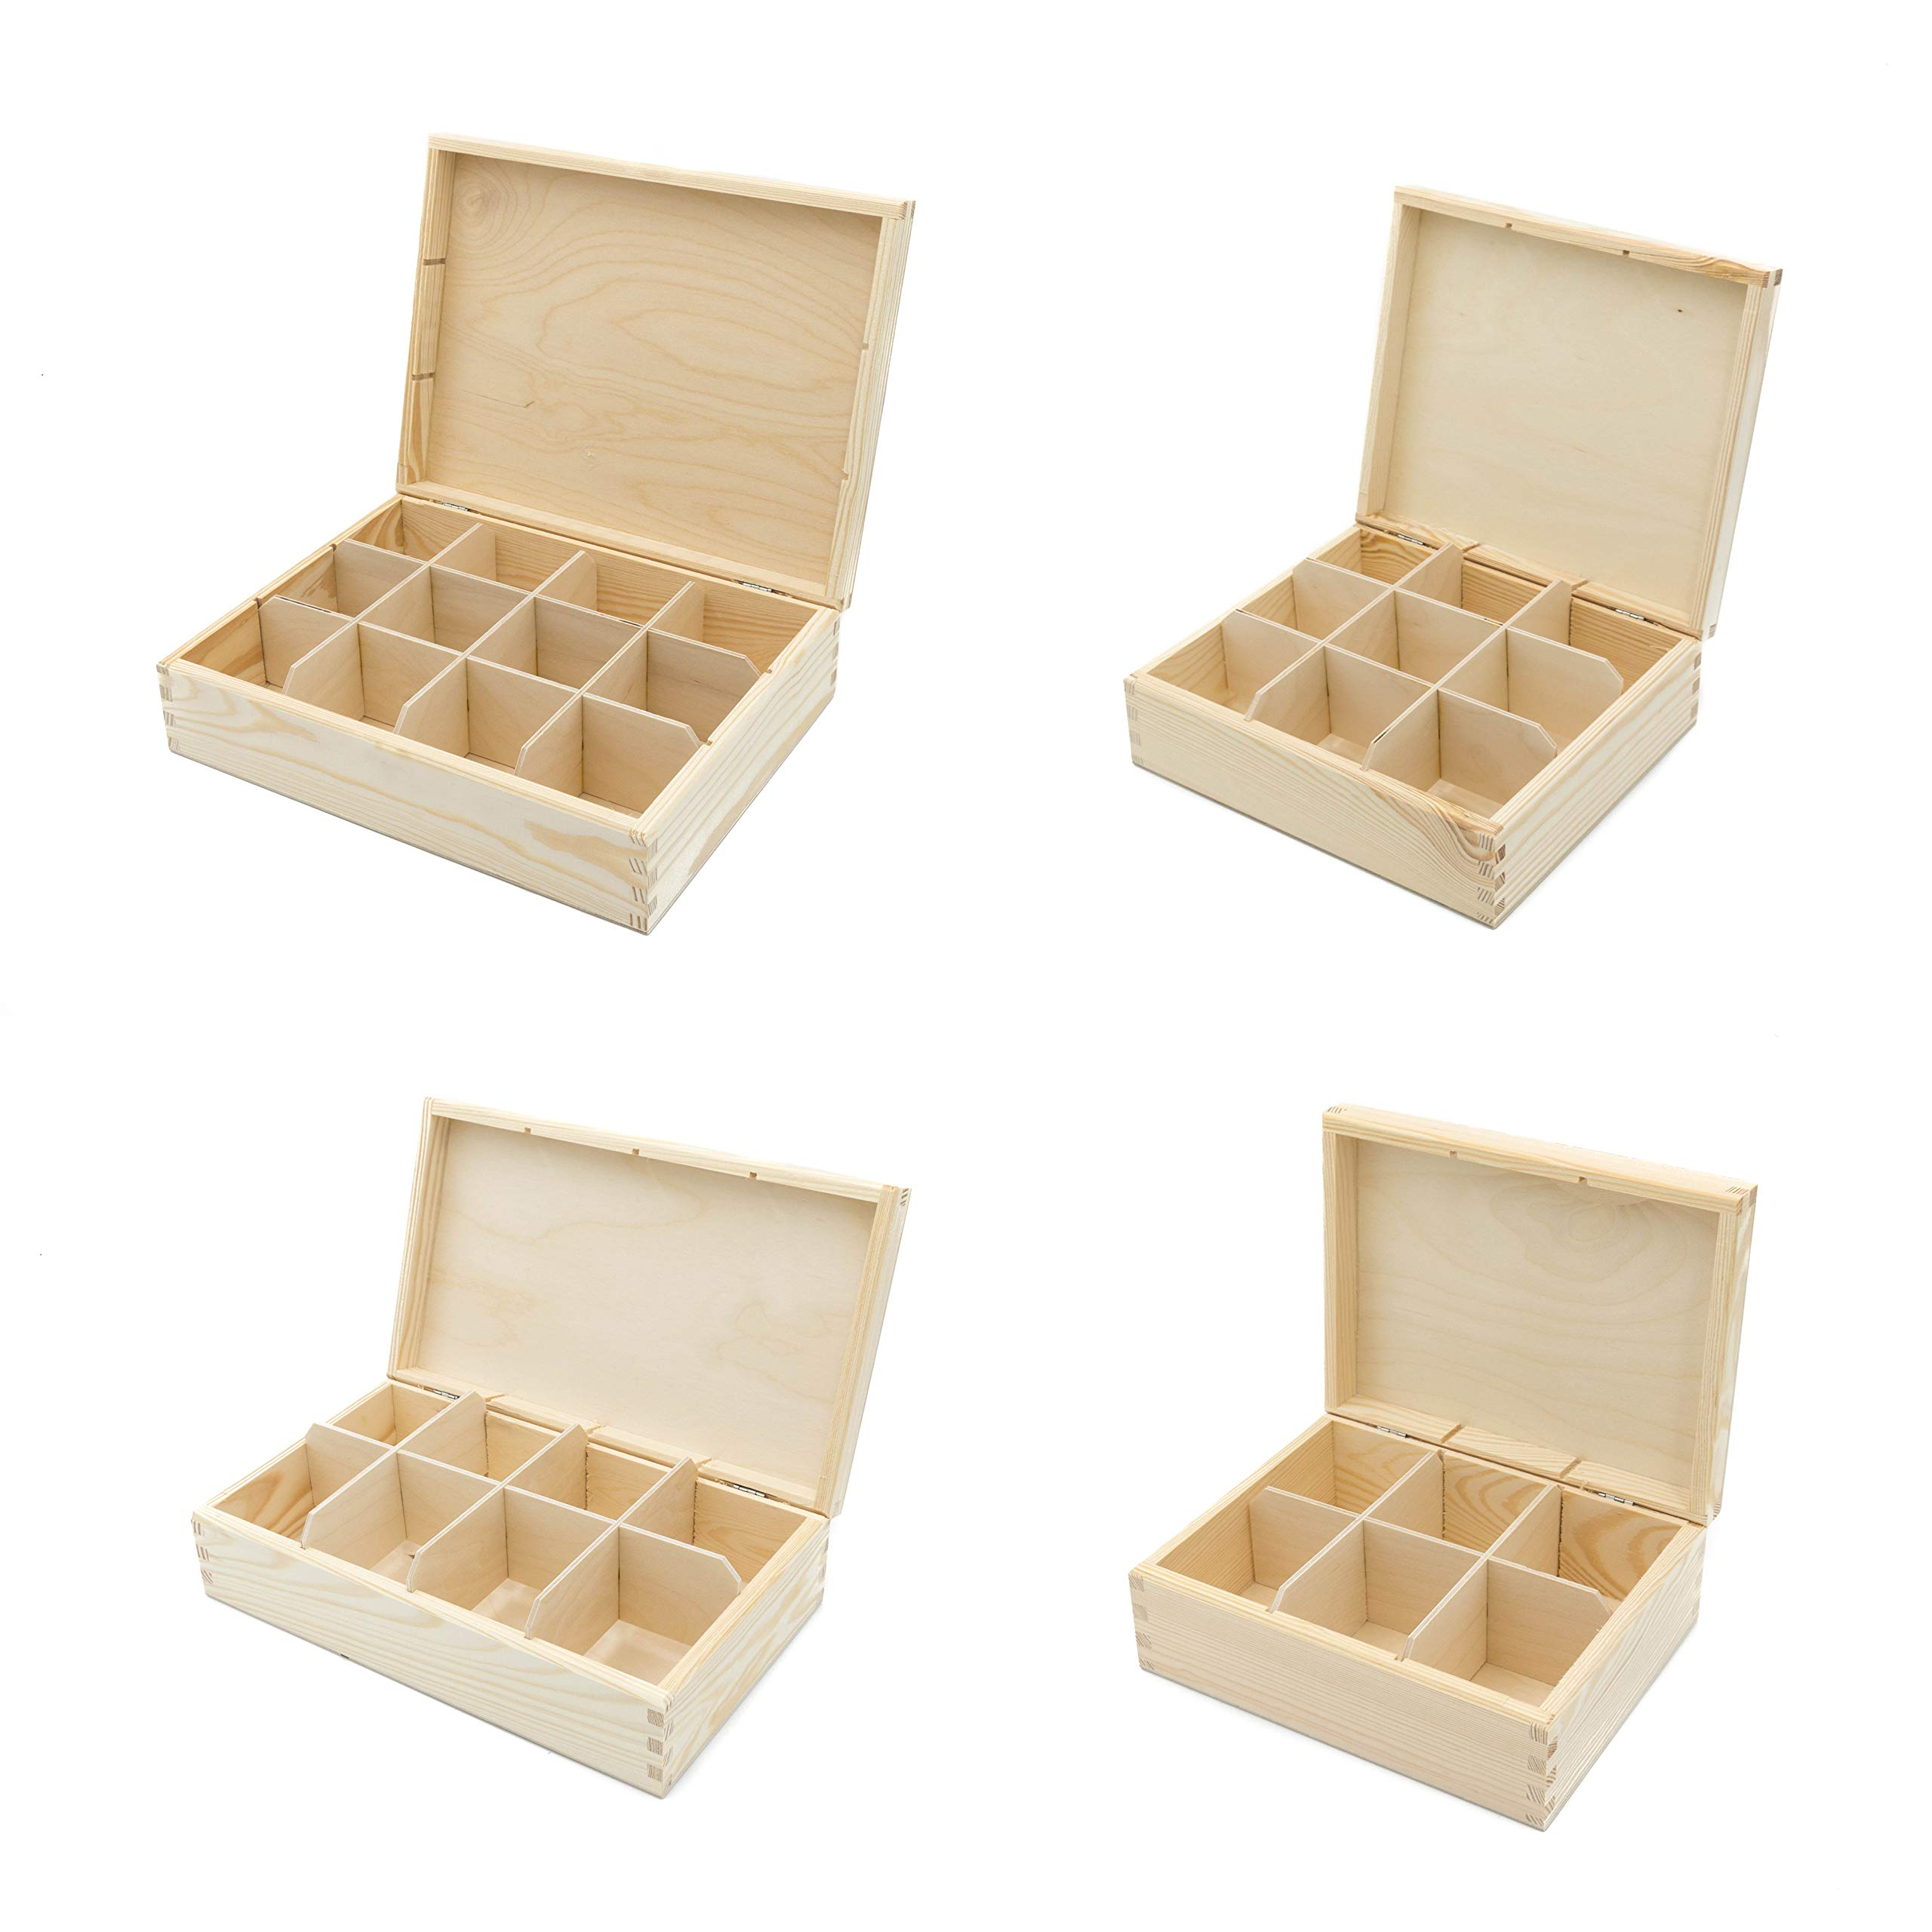 Caja de té de madera para almacenamiento – 3, 6, 8, 9,12 compartimentos (9 compartimentos): Amazon.es: Hogar